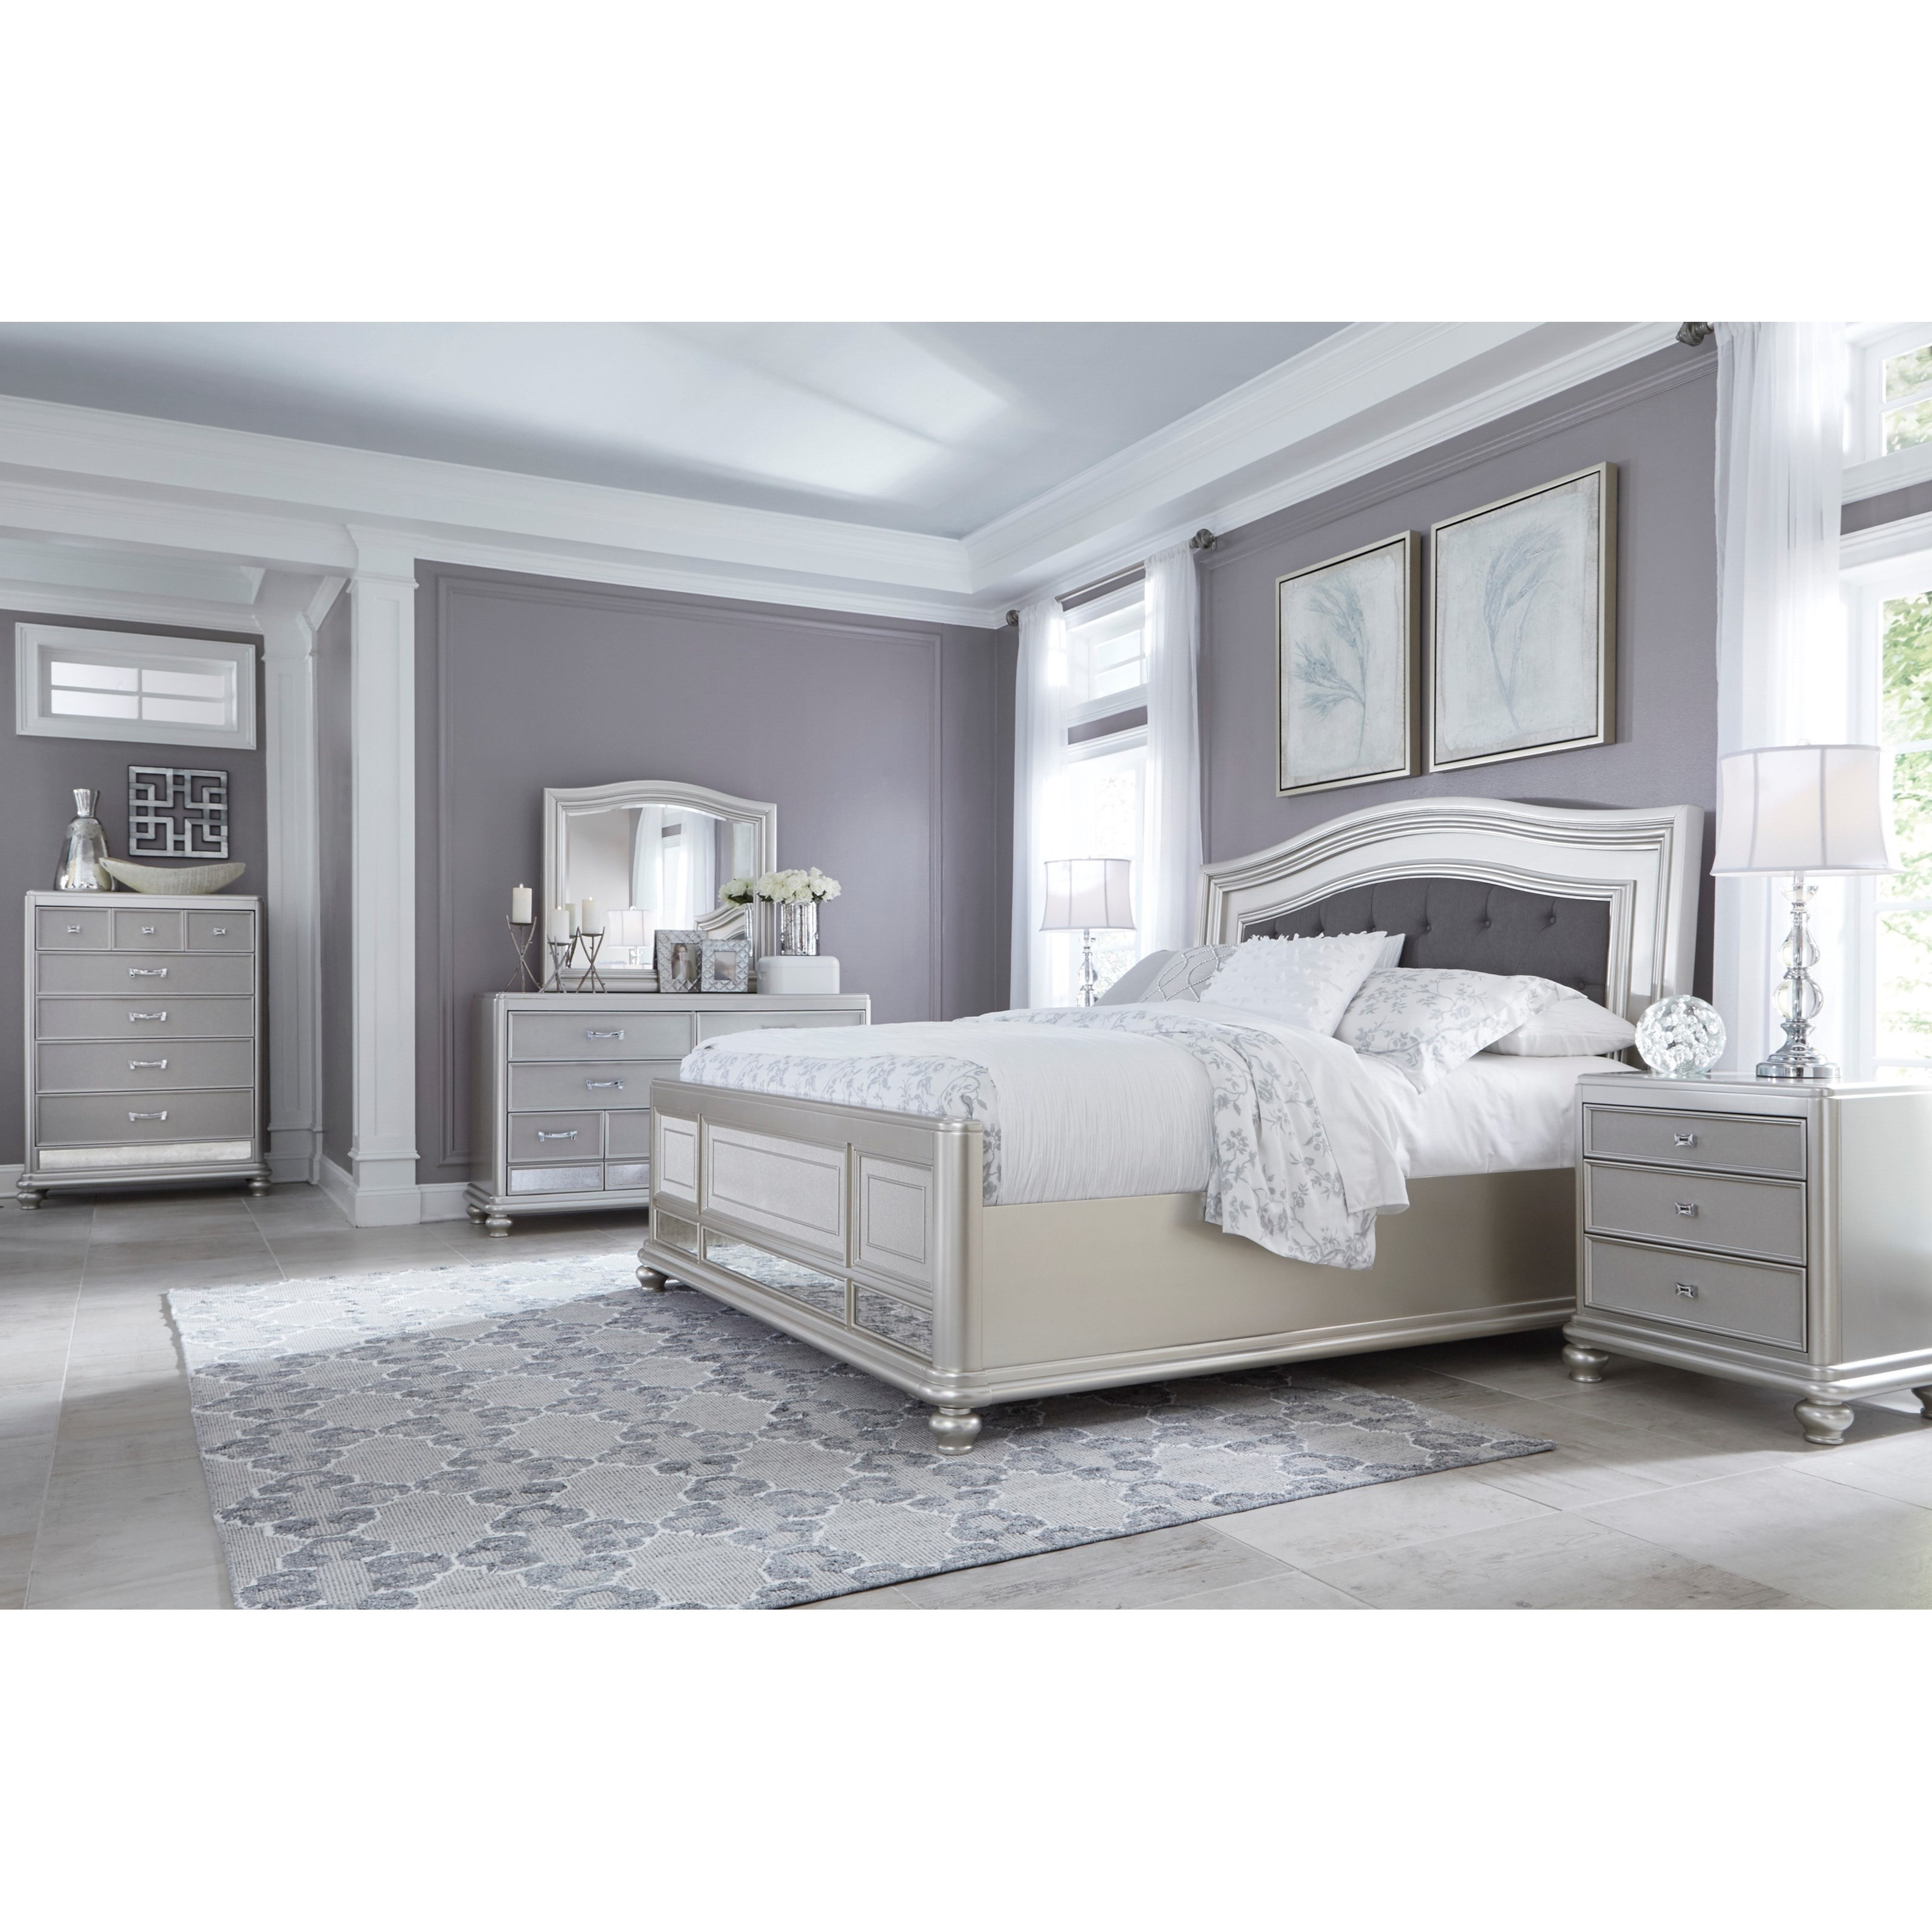 Signature Design by Ashley Coralayne Dresser & Arched Bedroom Mirror De